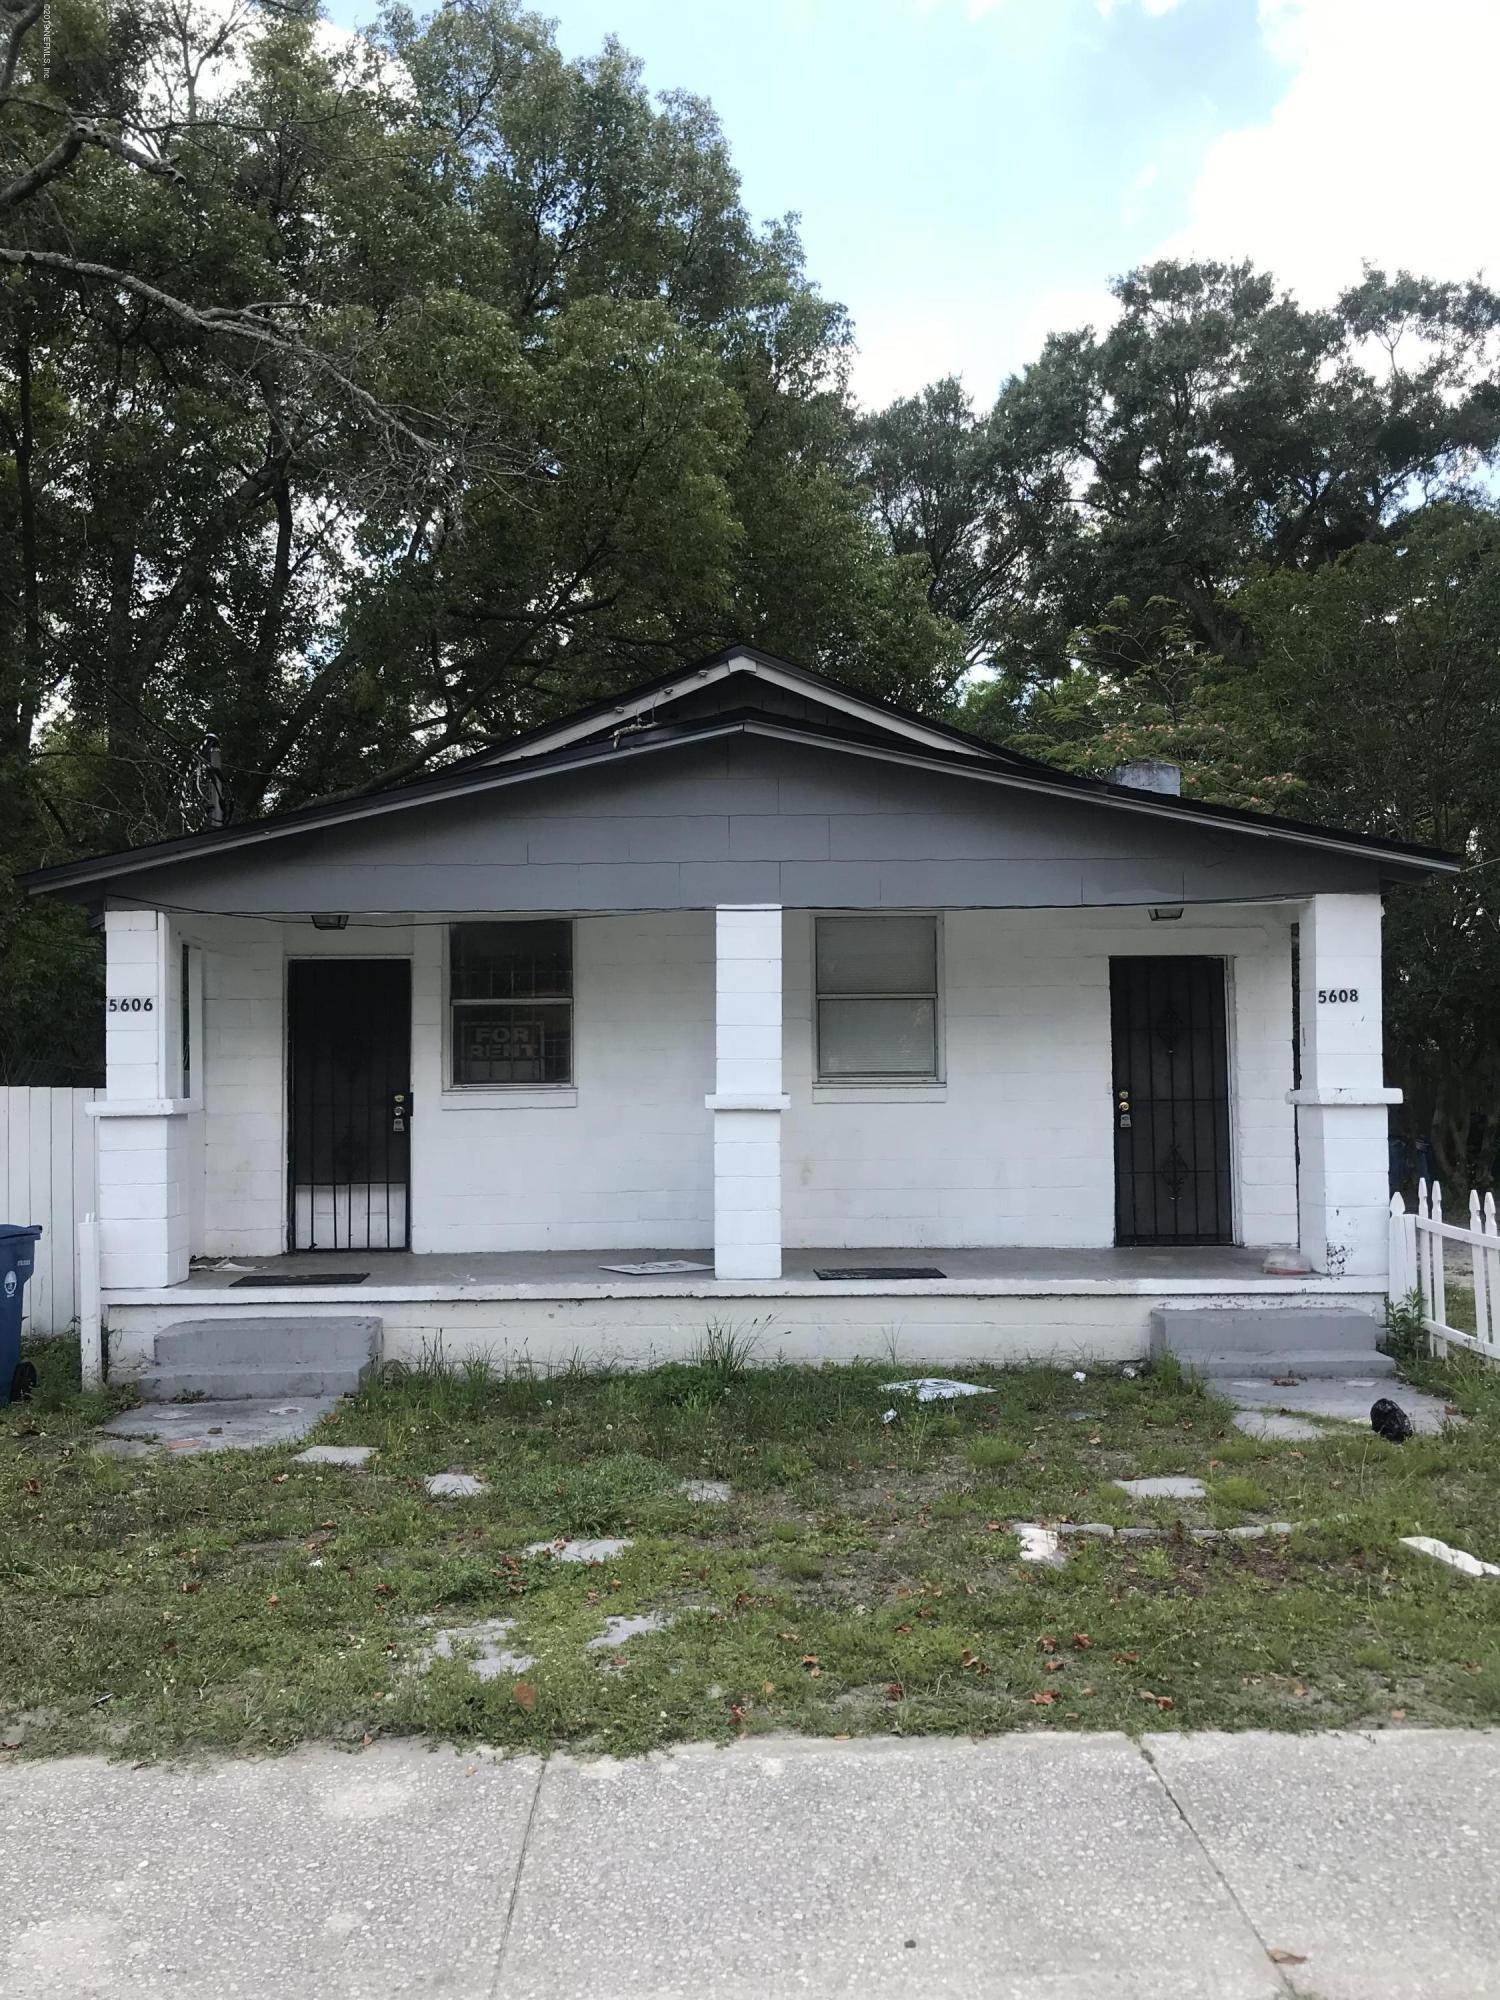 5606 MONCRIEF, JACKSONVILLE, FLORIDA 32209, 4 Bedrooms Bedrooms, ,2 BathroomsBathrooms,Commercial,For sale,MONCRIEF,996555